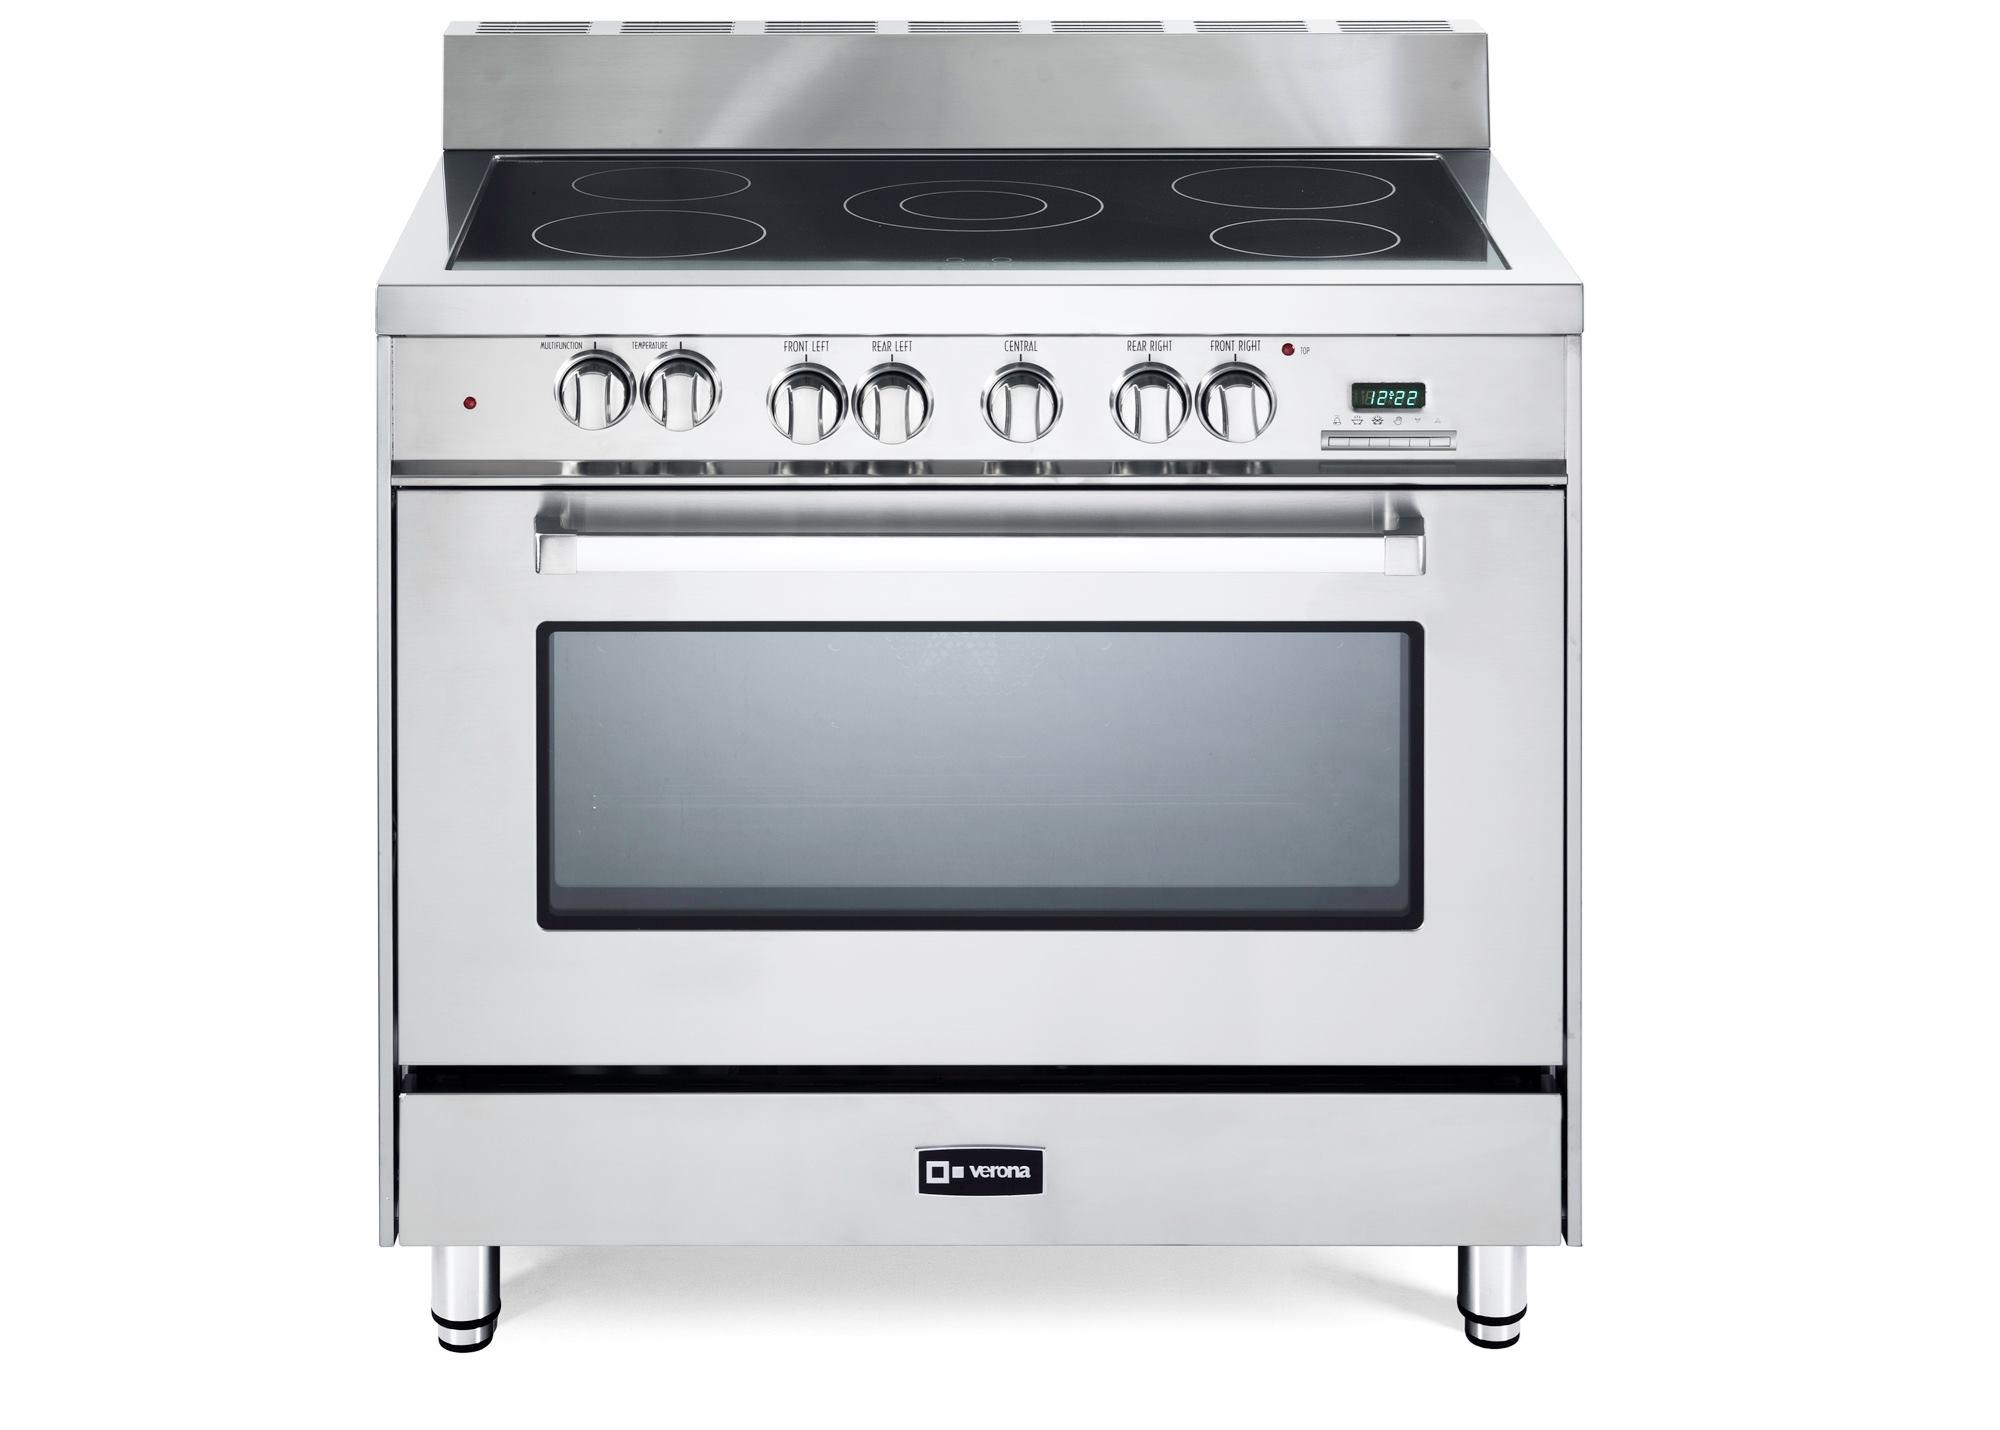 Verona Appliances 36 Inch All Electric Range Jlc Online